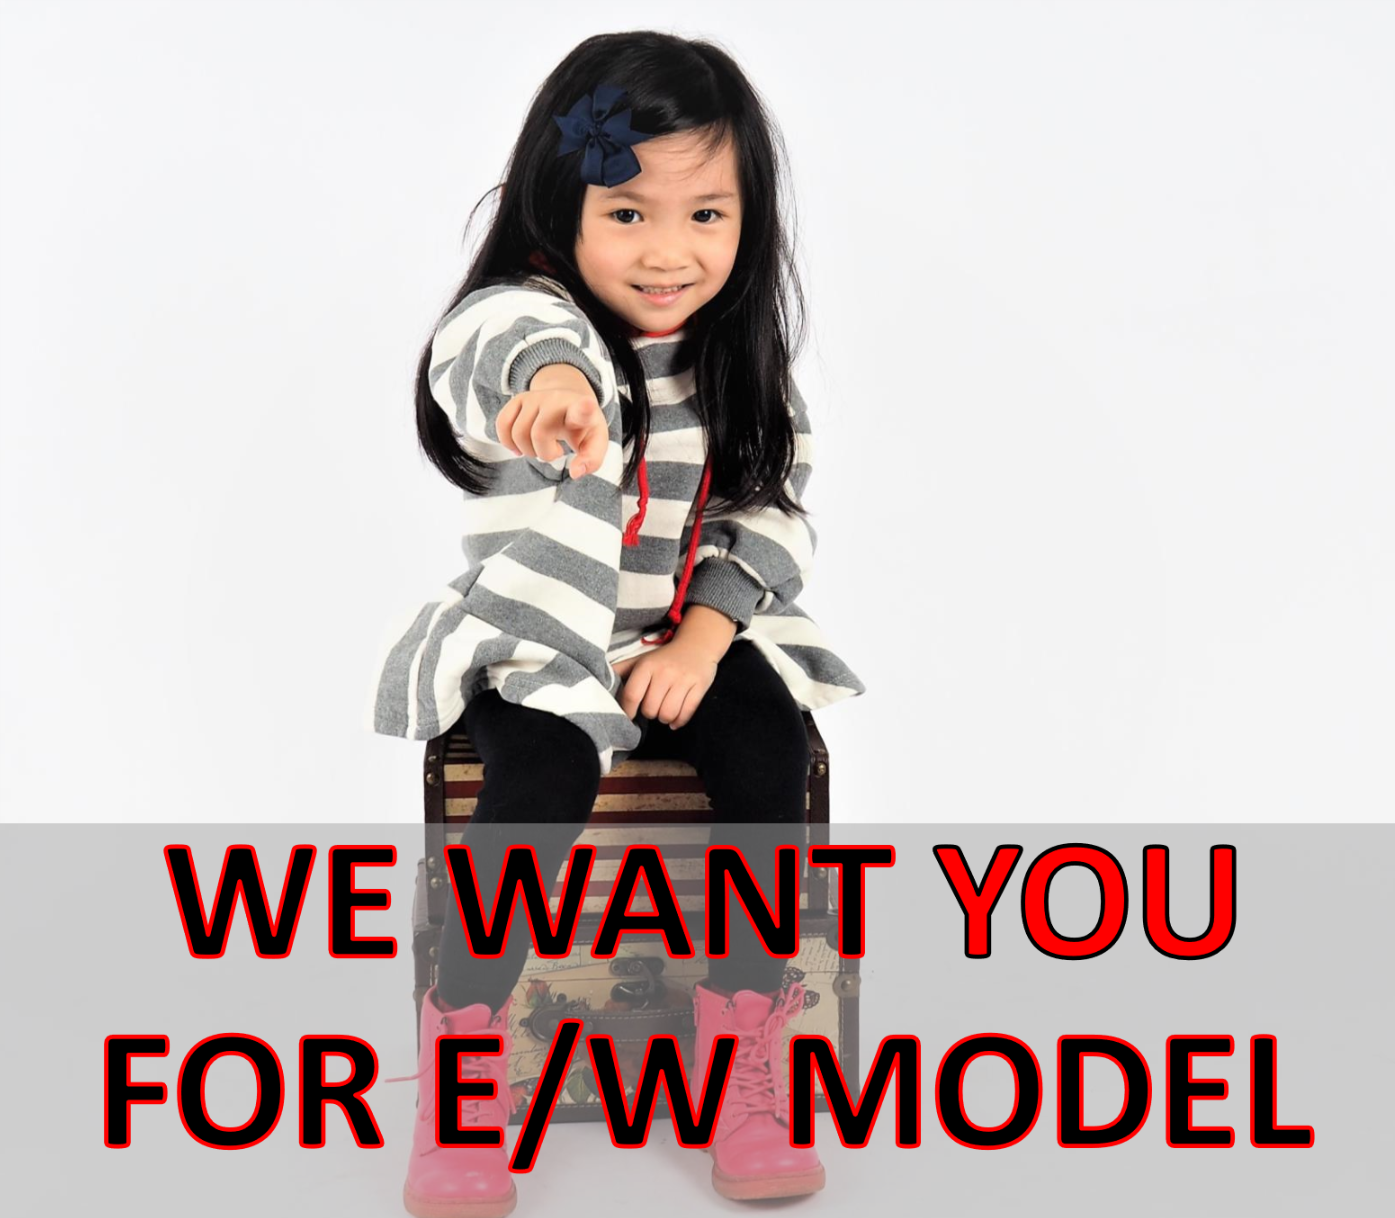 EW The Global Modelling Agency